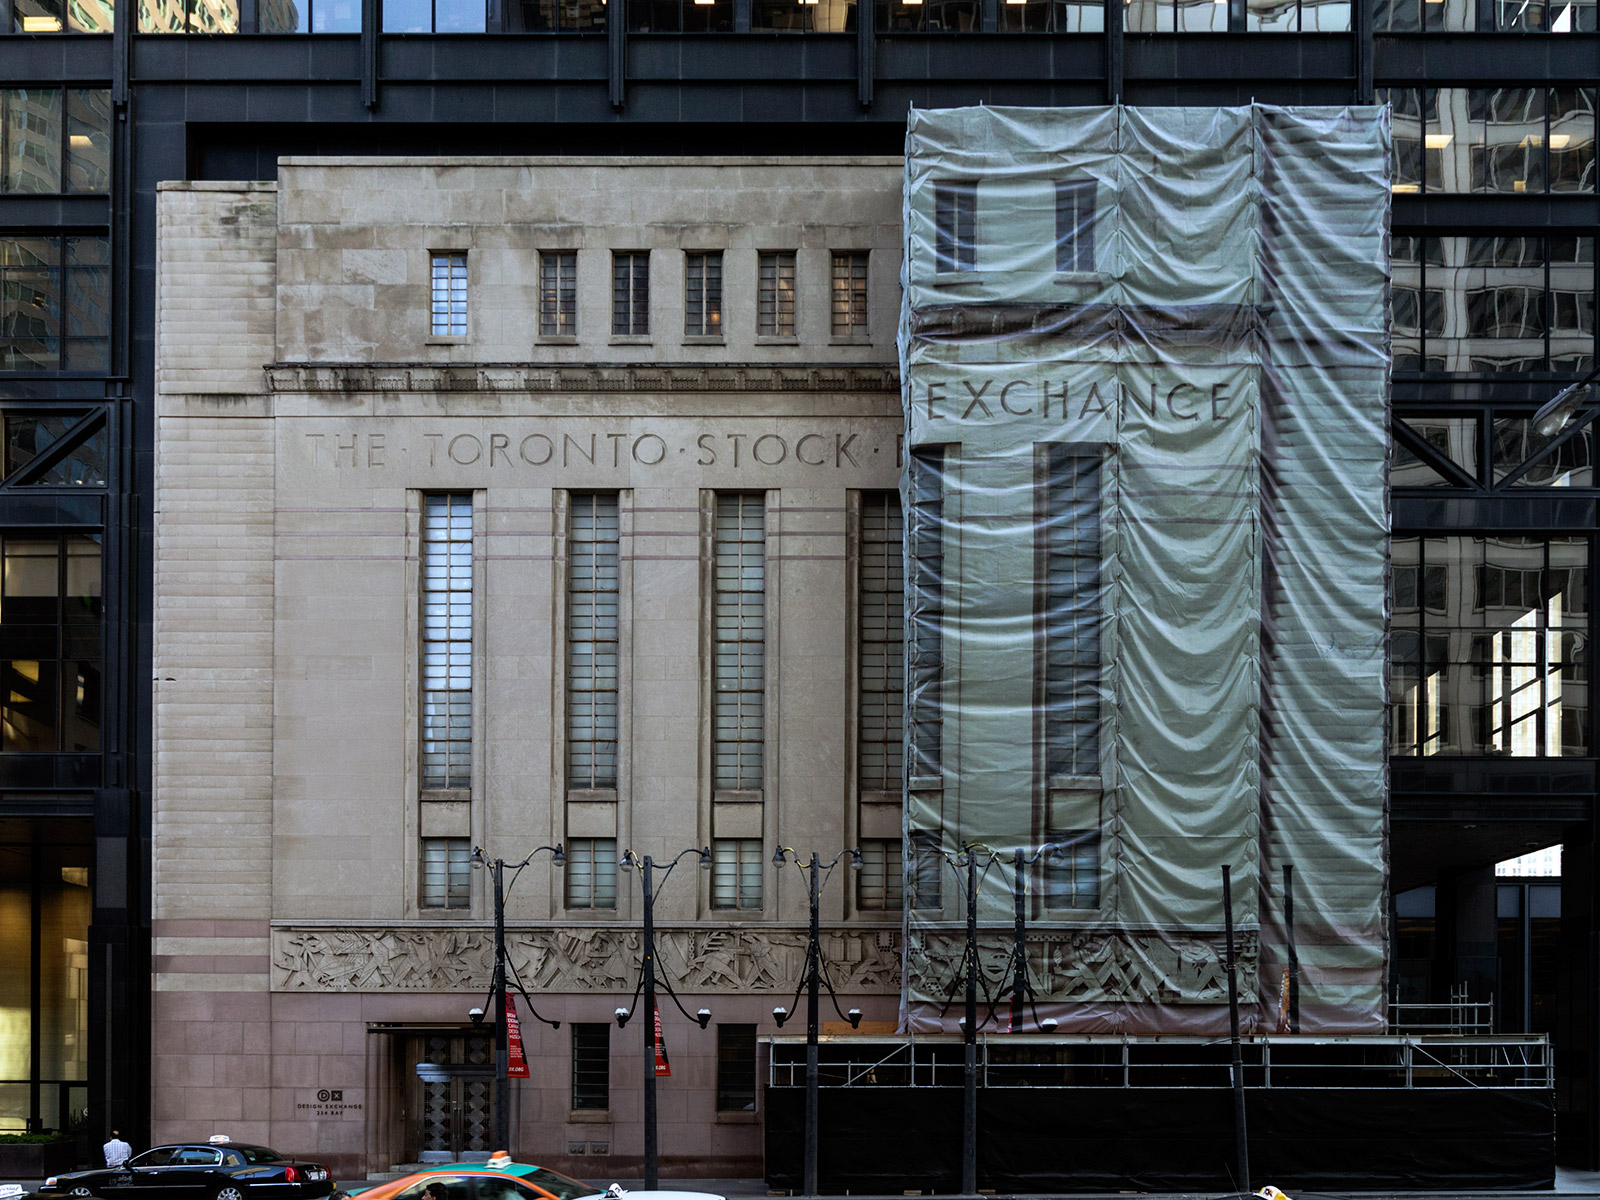 20150714. Undergoing restoration, Toronto's Design Exchange is u